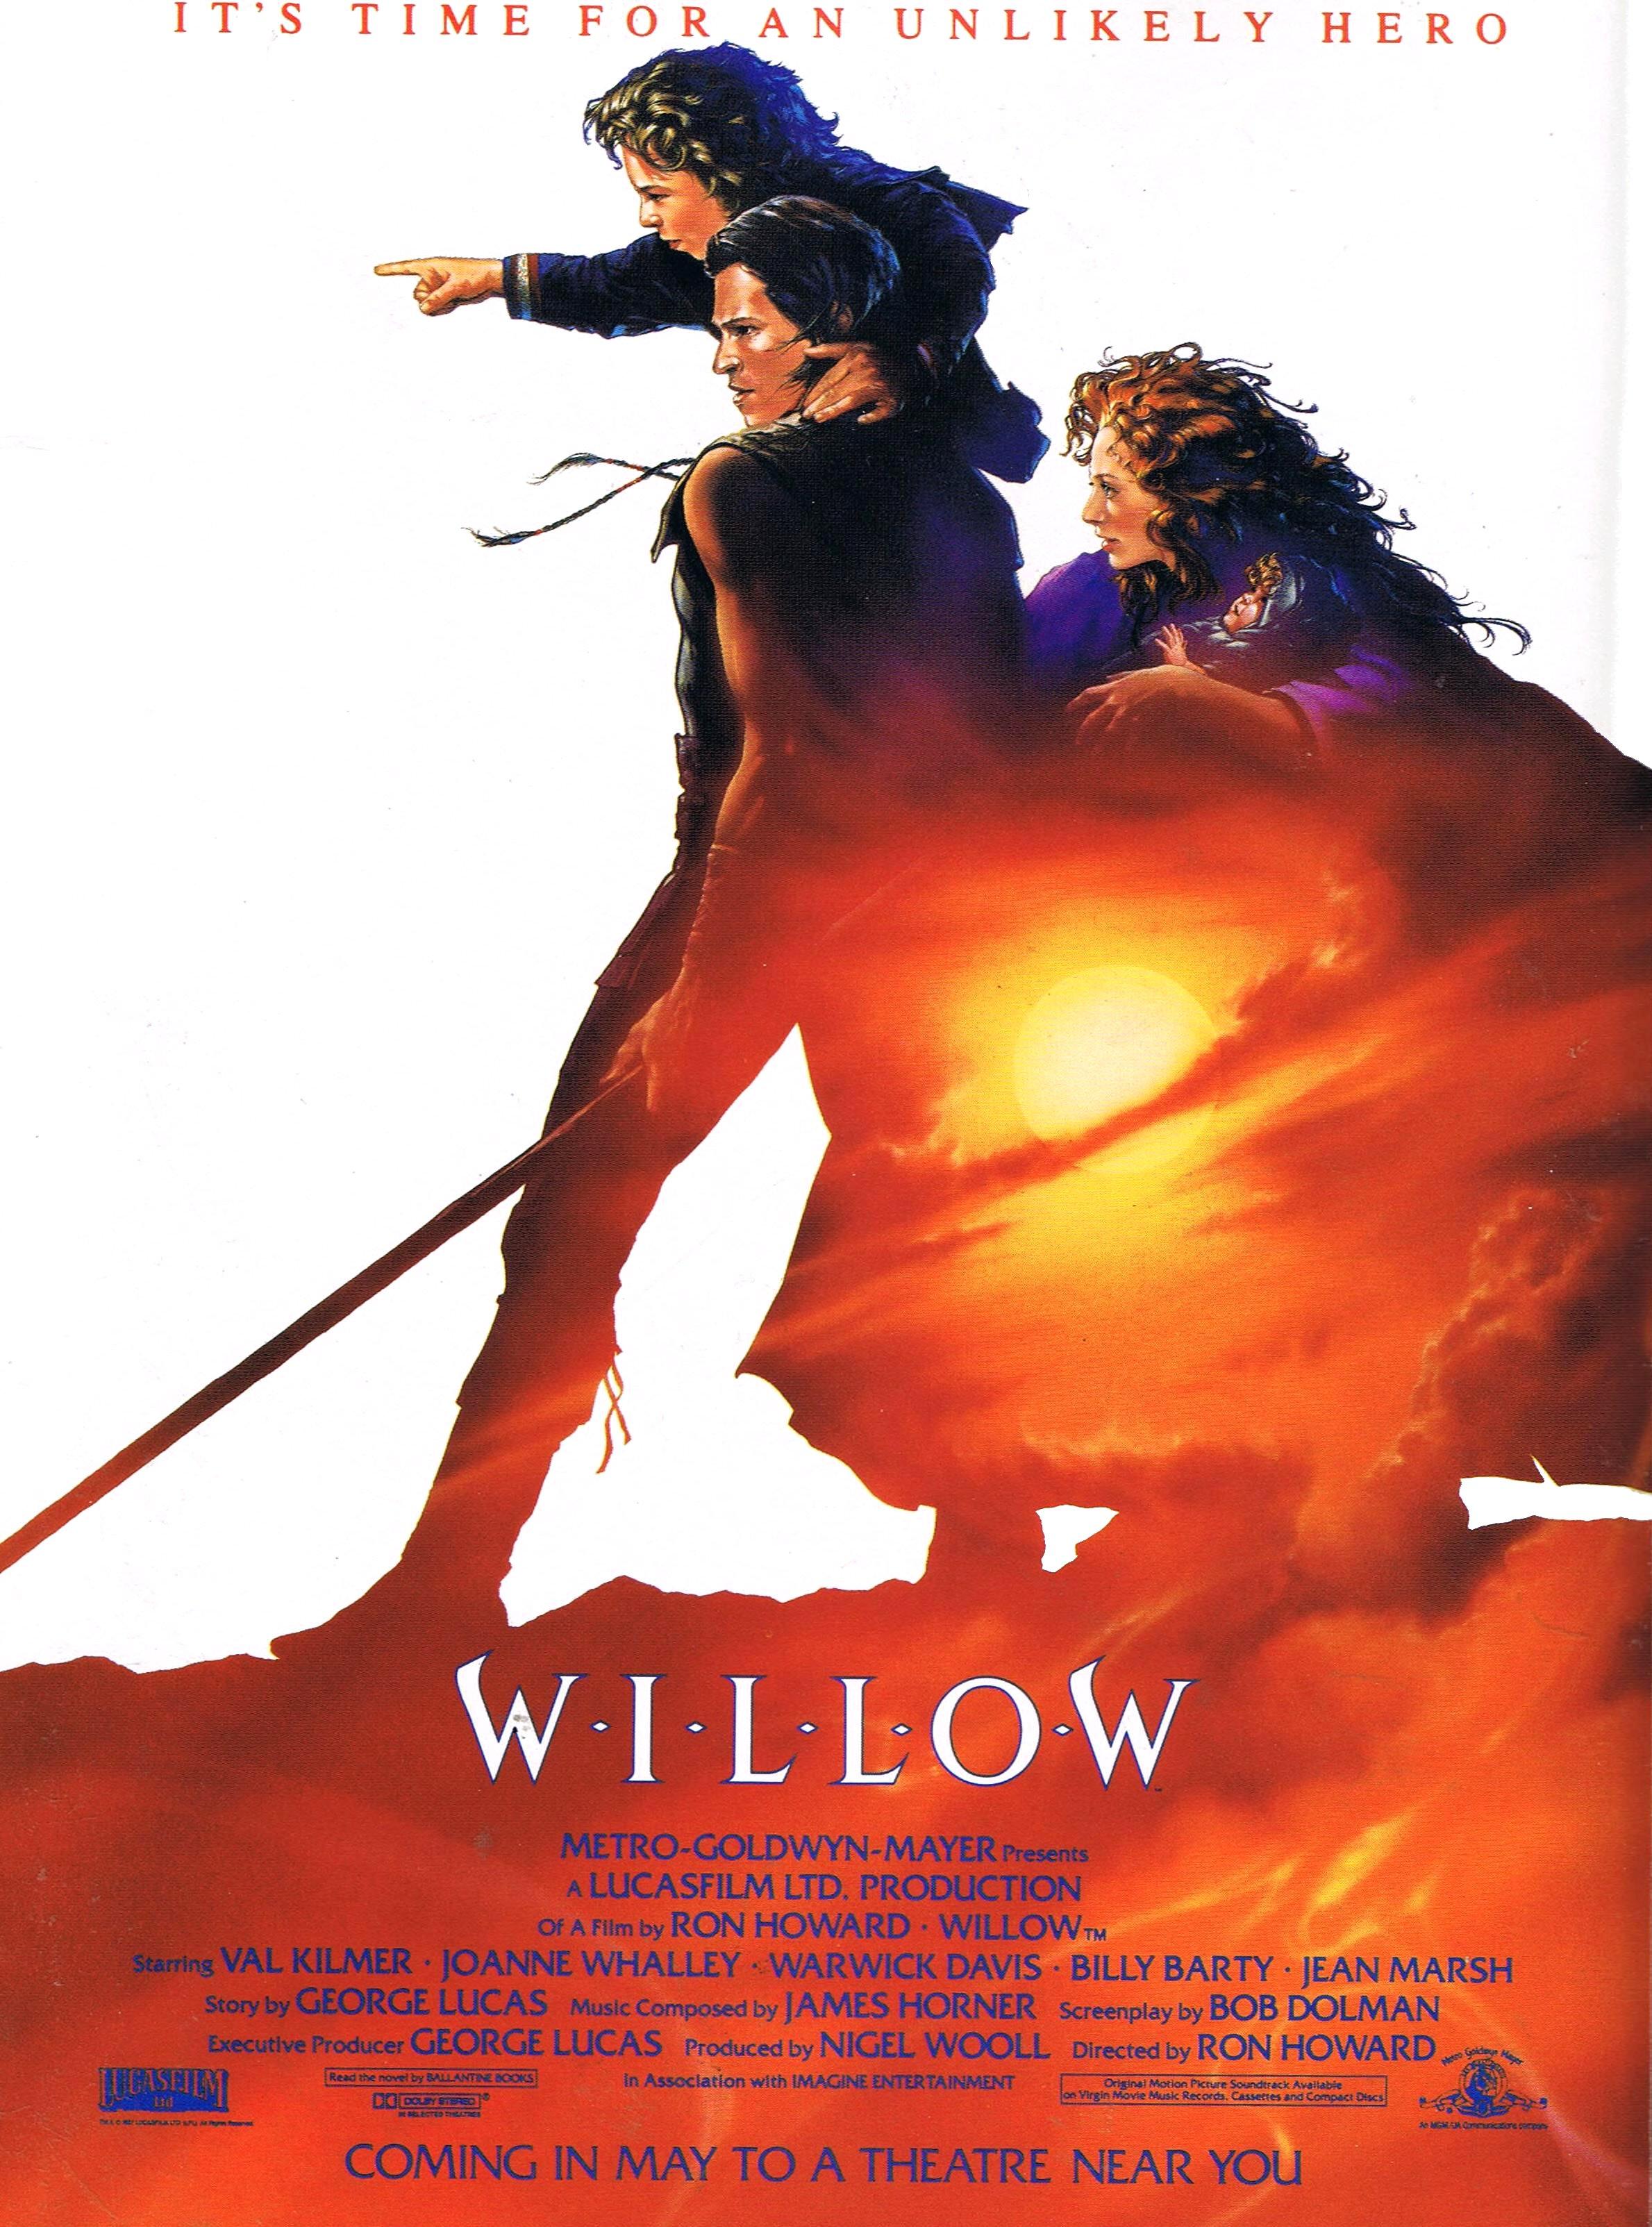 Willow teaser